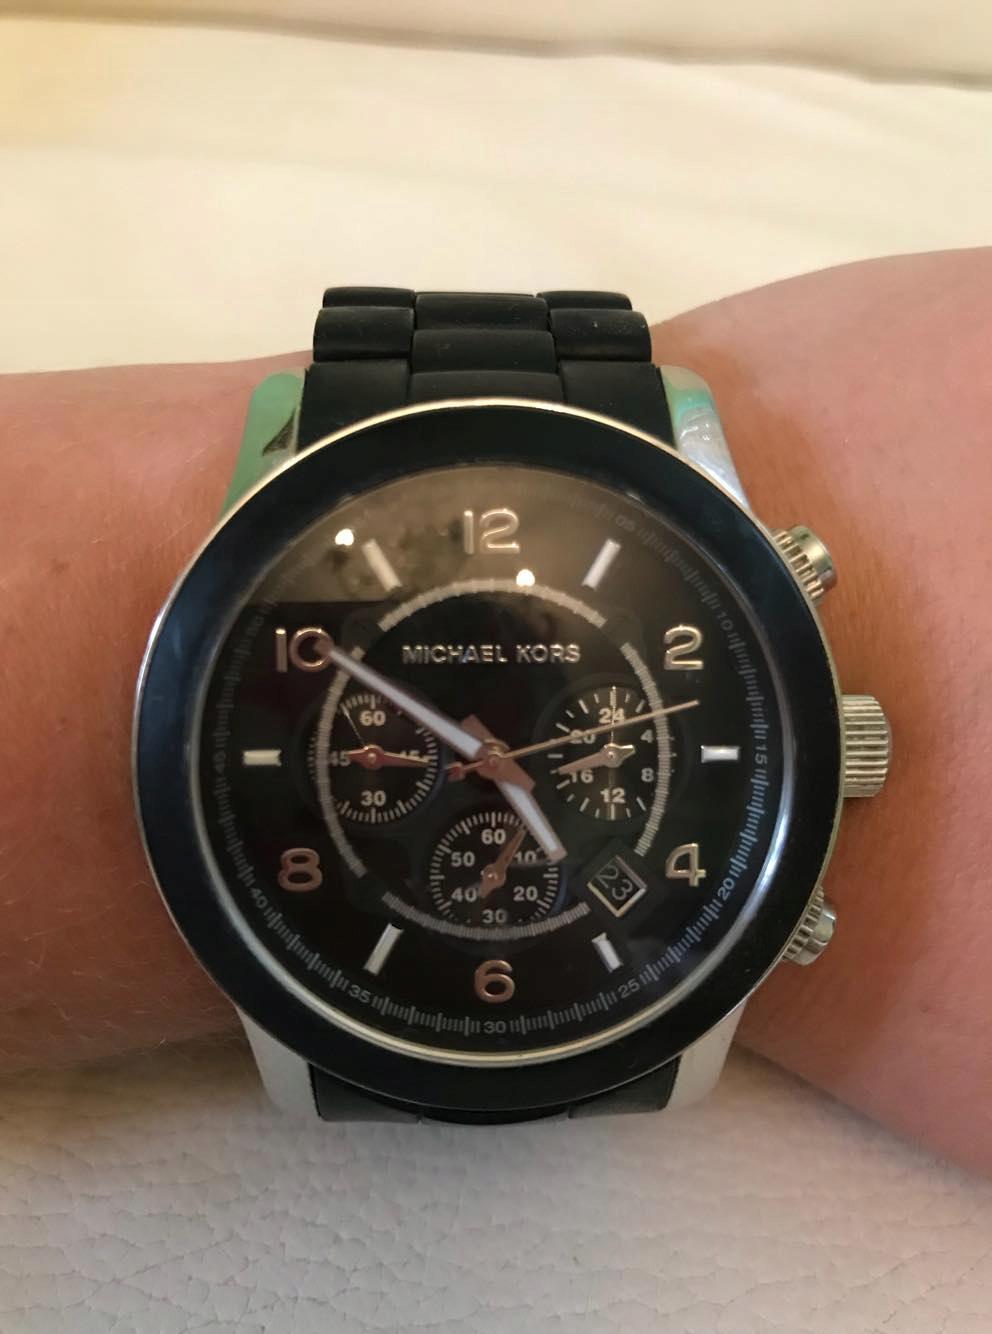 MICHAEL KORS - Luksusowy zegarek / uniseks / !